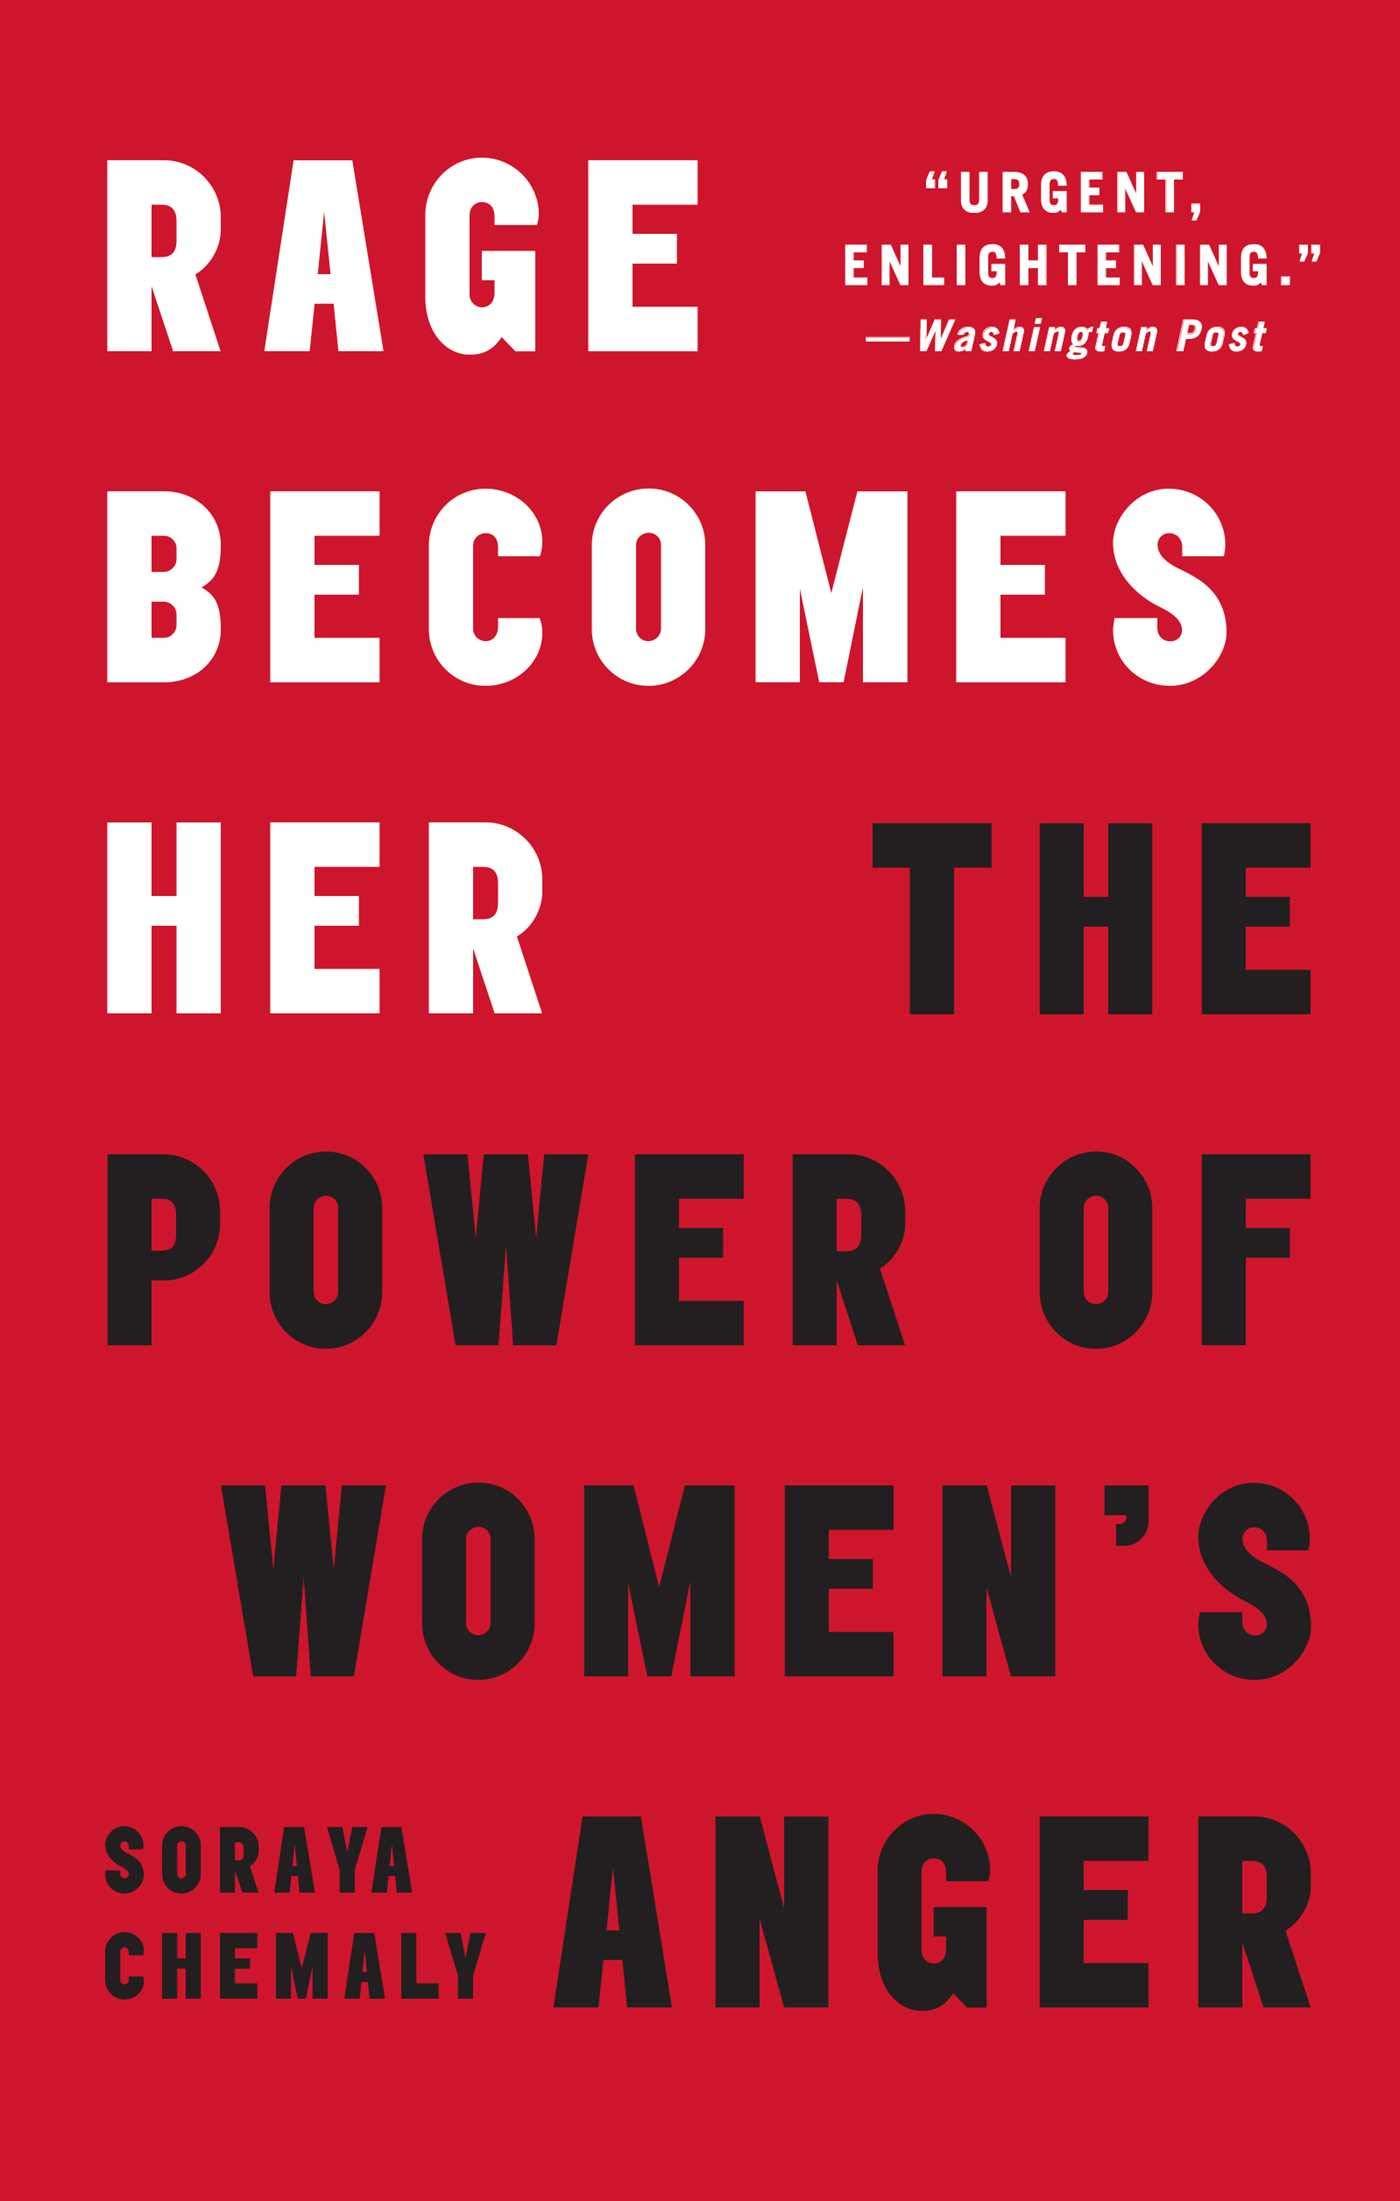 Rage Becomes Her: The Power of Women's Anger: Chemaly, Soraya: 9781501189562: Amazon.com: Books